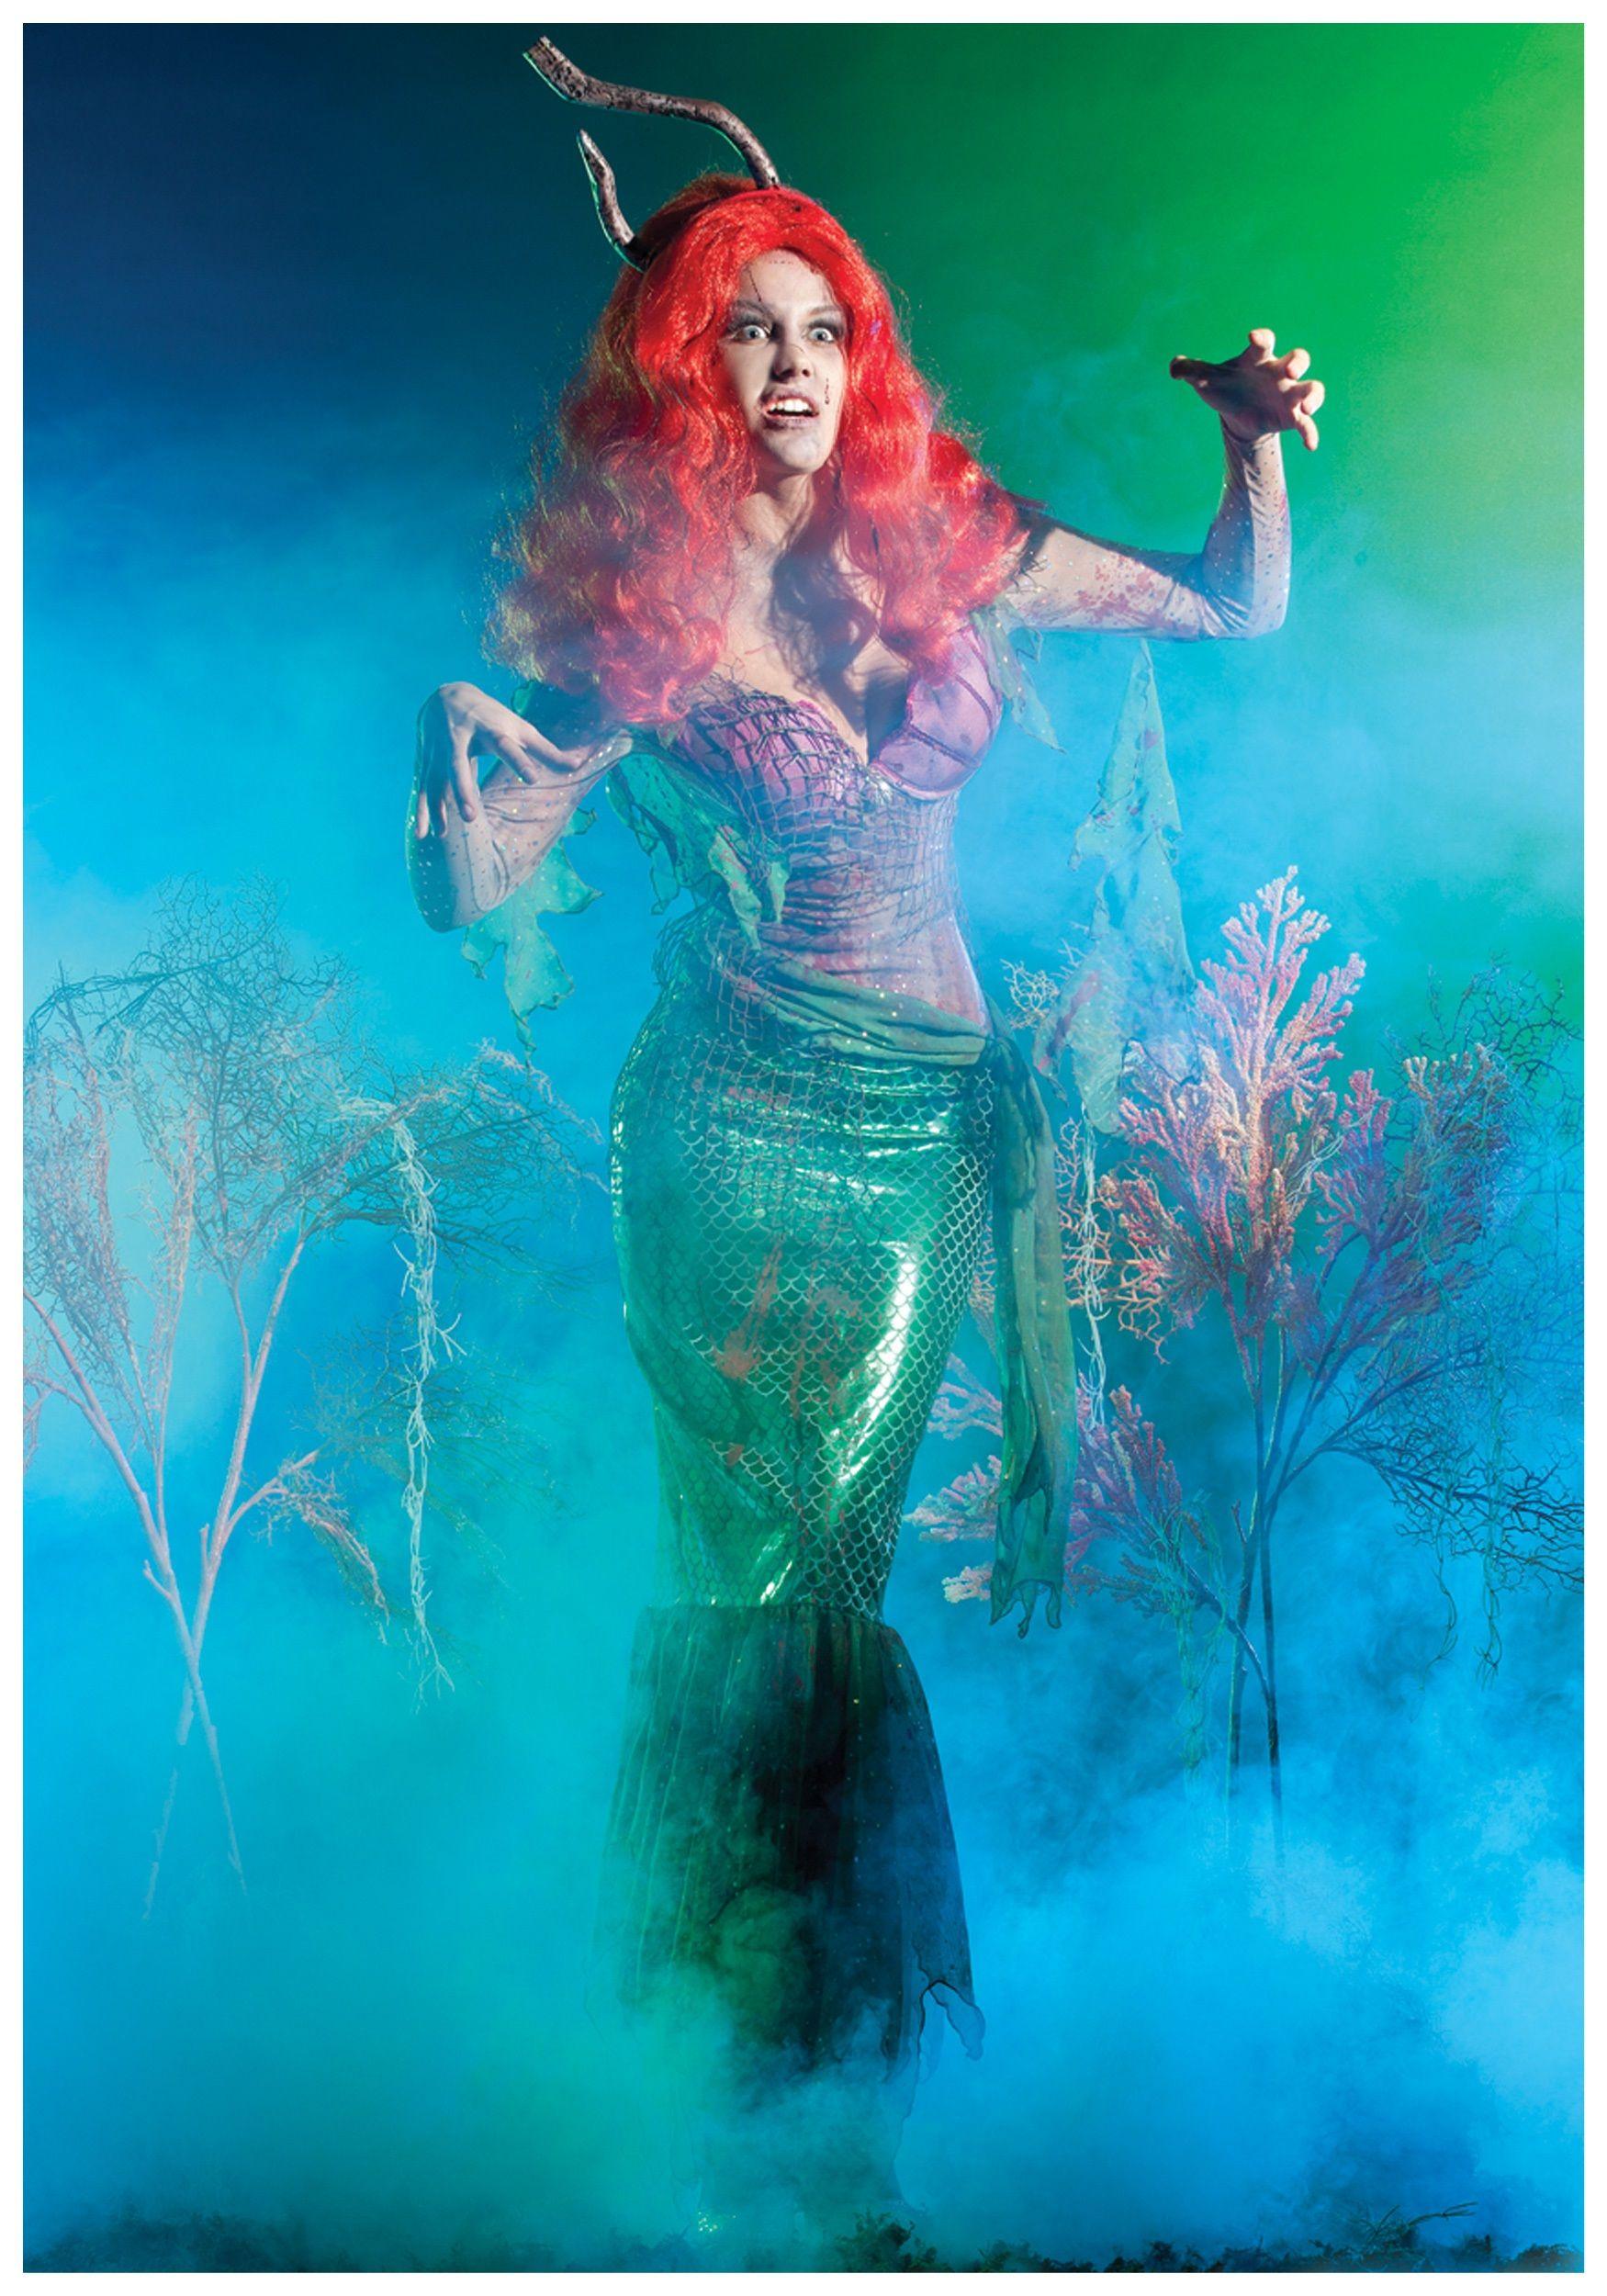 Mermaid Zombie Costume | Costumes and Halloween ideas